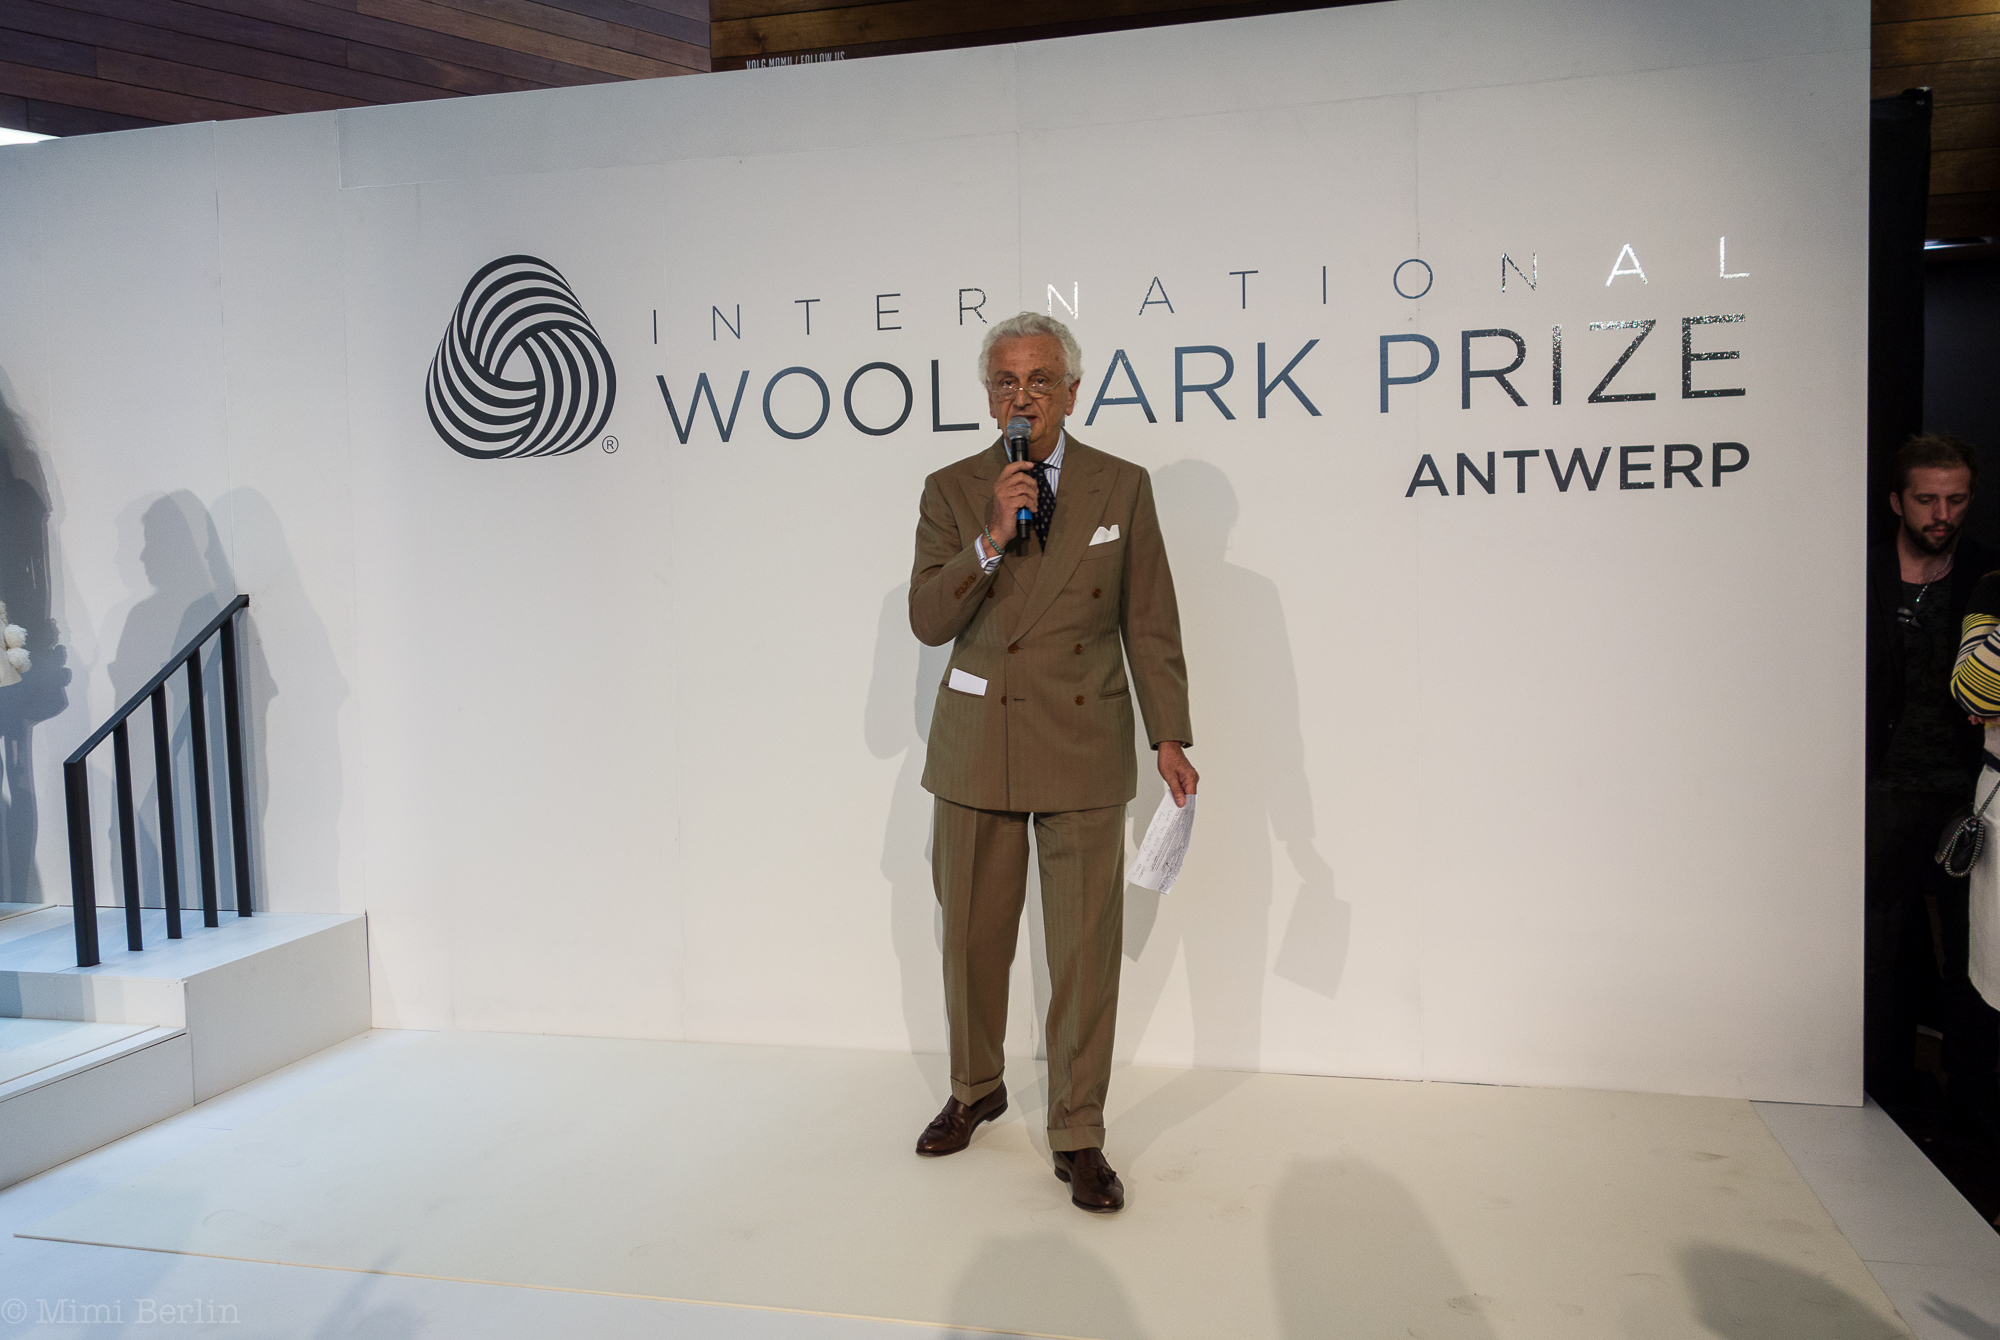 Fabrizio Servente, The Woolmark Company Global Strategy Advisor